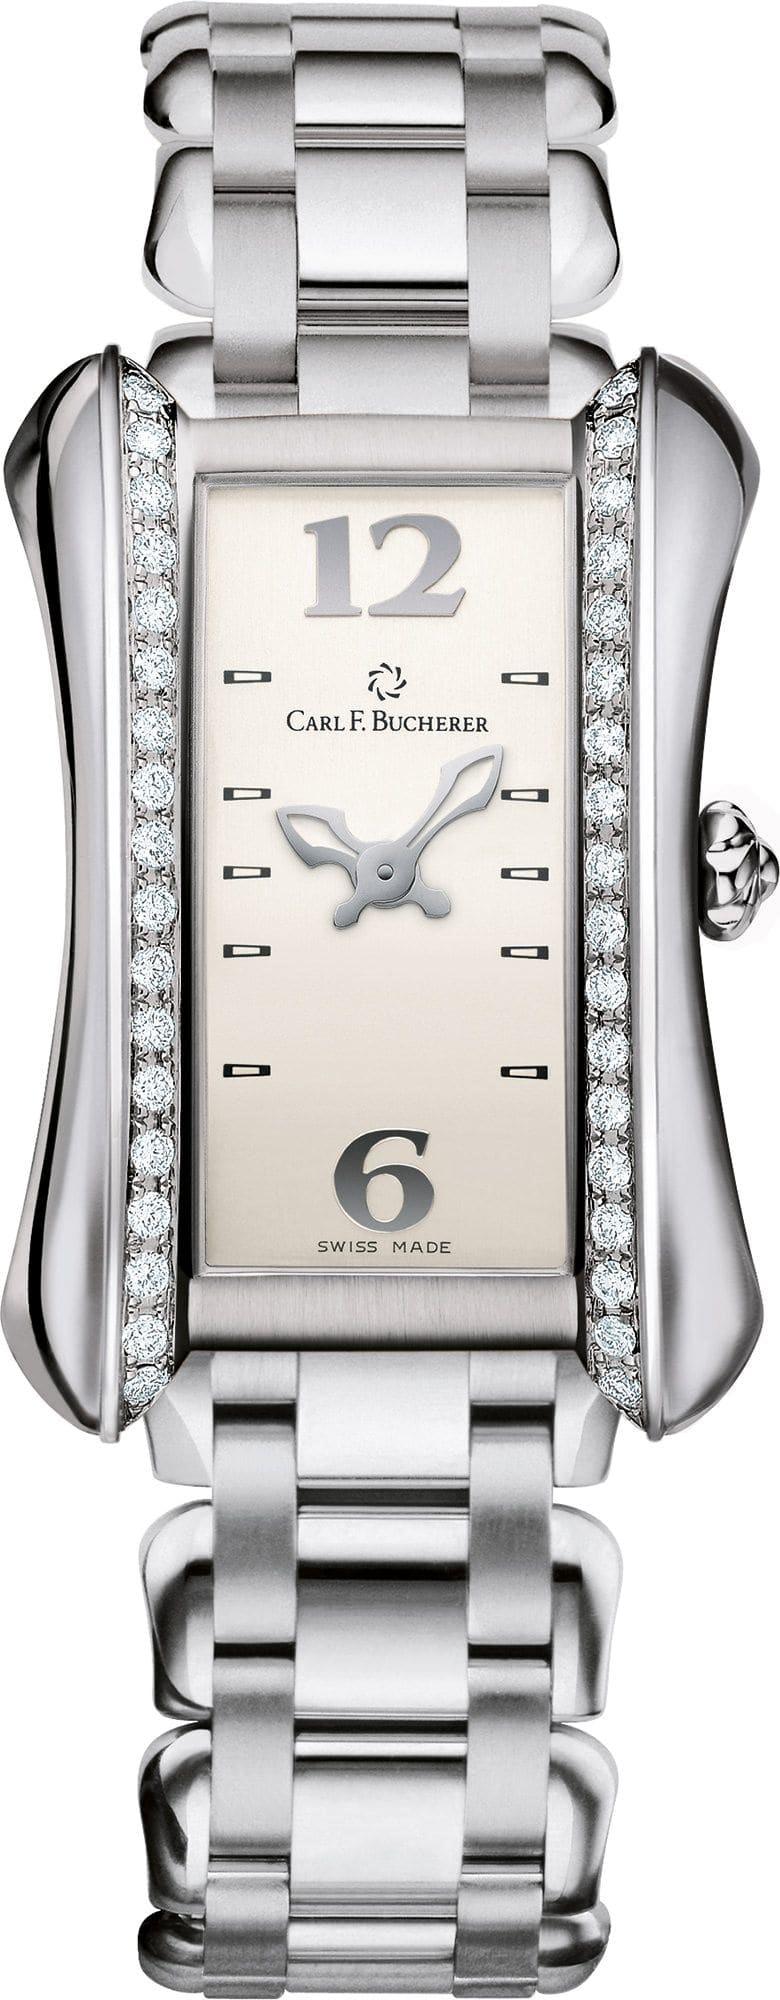 Carl F. Bucherer Alacria Queen Diamond 00.10701.08.16.31